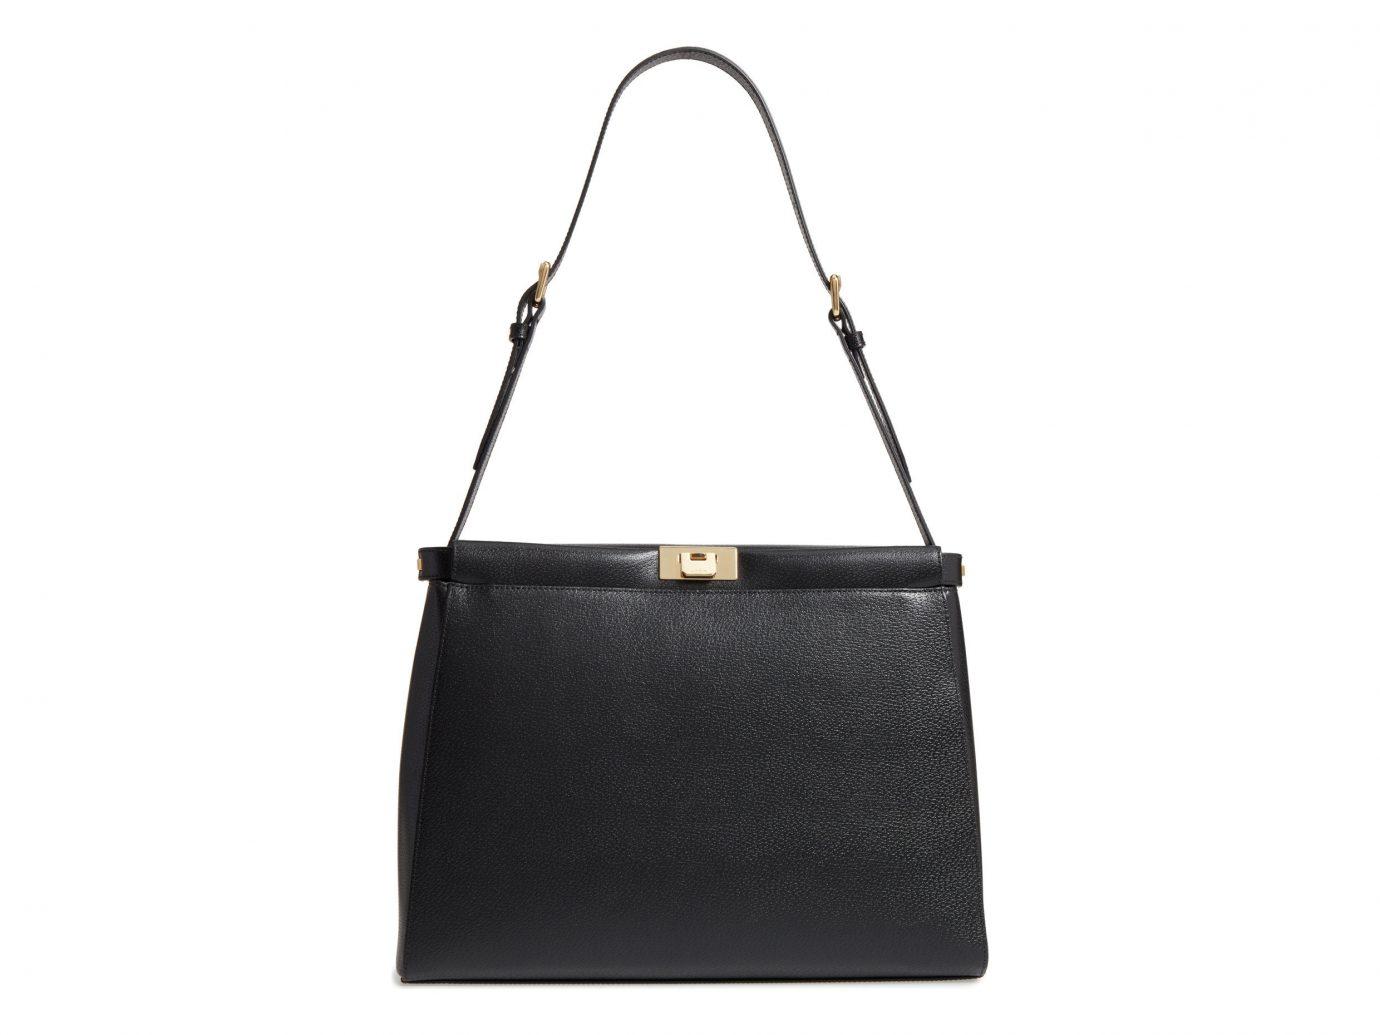 Packing Tips Style + Design Travel Shop Weekend Getaways bag black white handbag shoulder bag leather product accessory product design brand rectangle strap